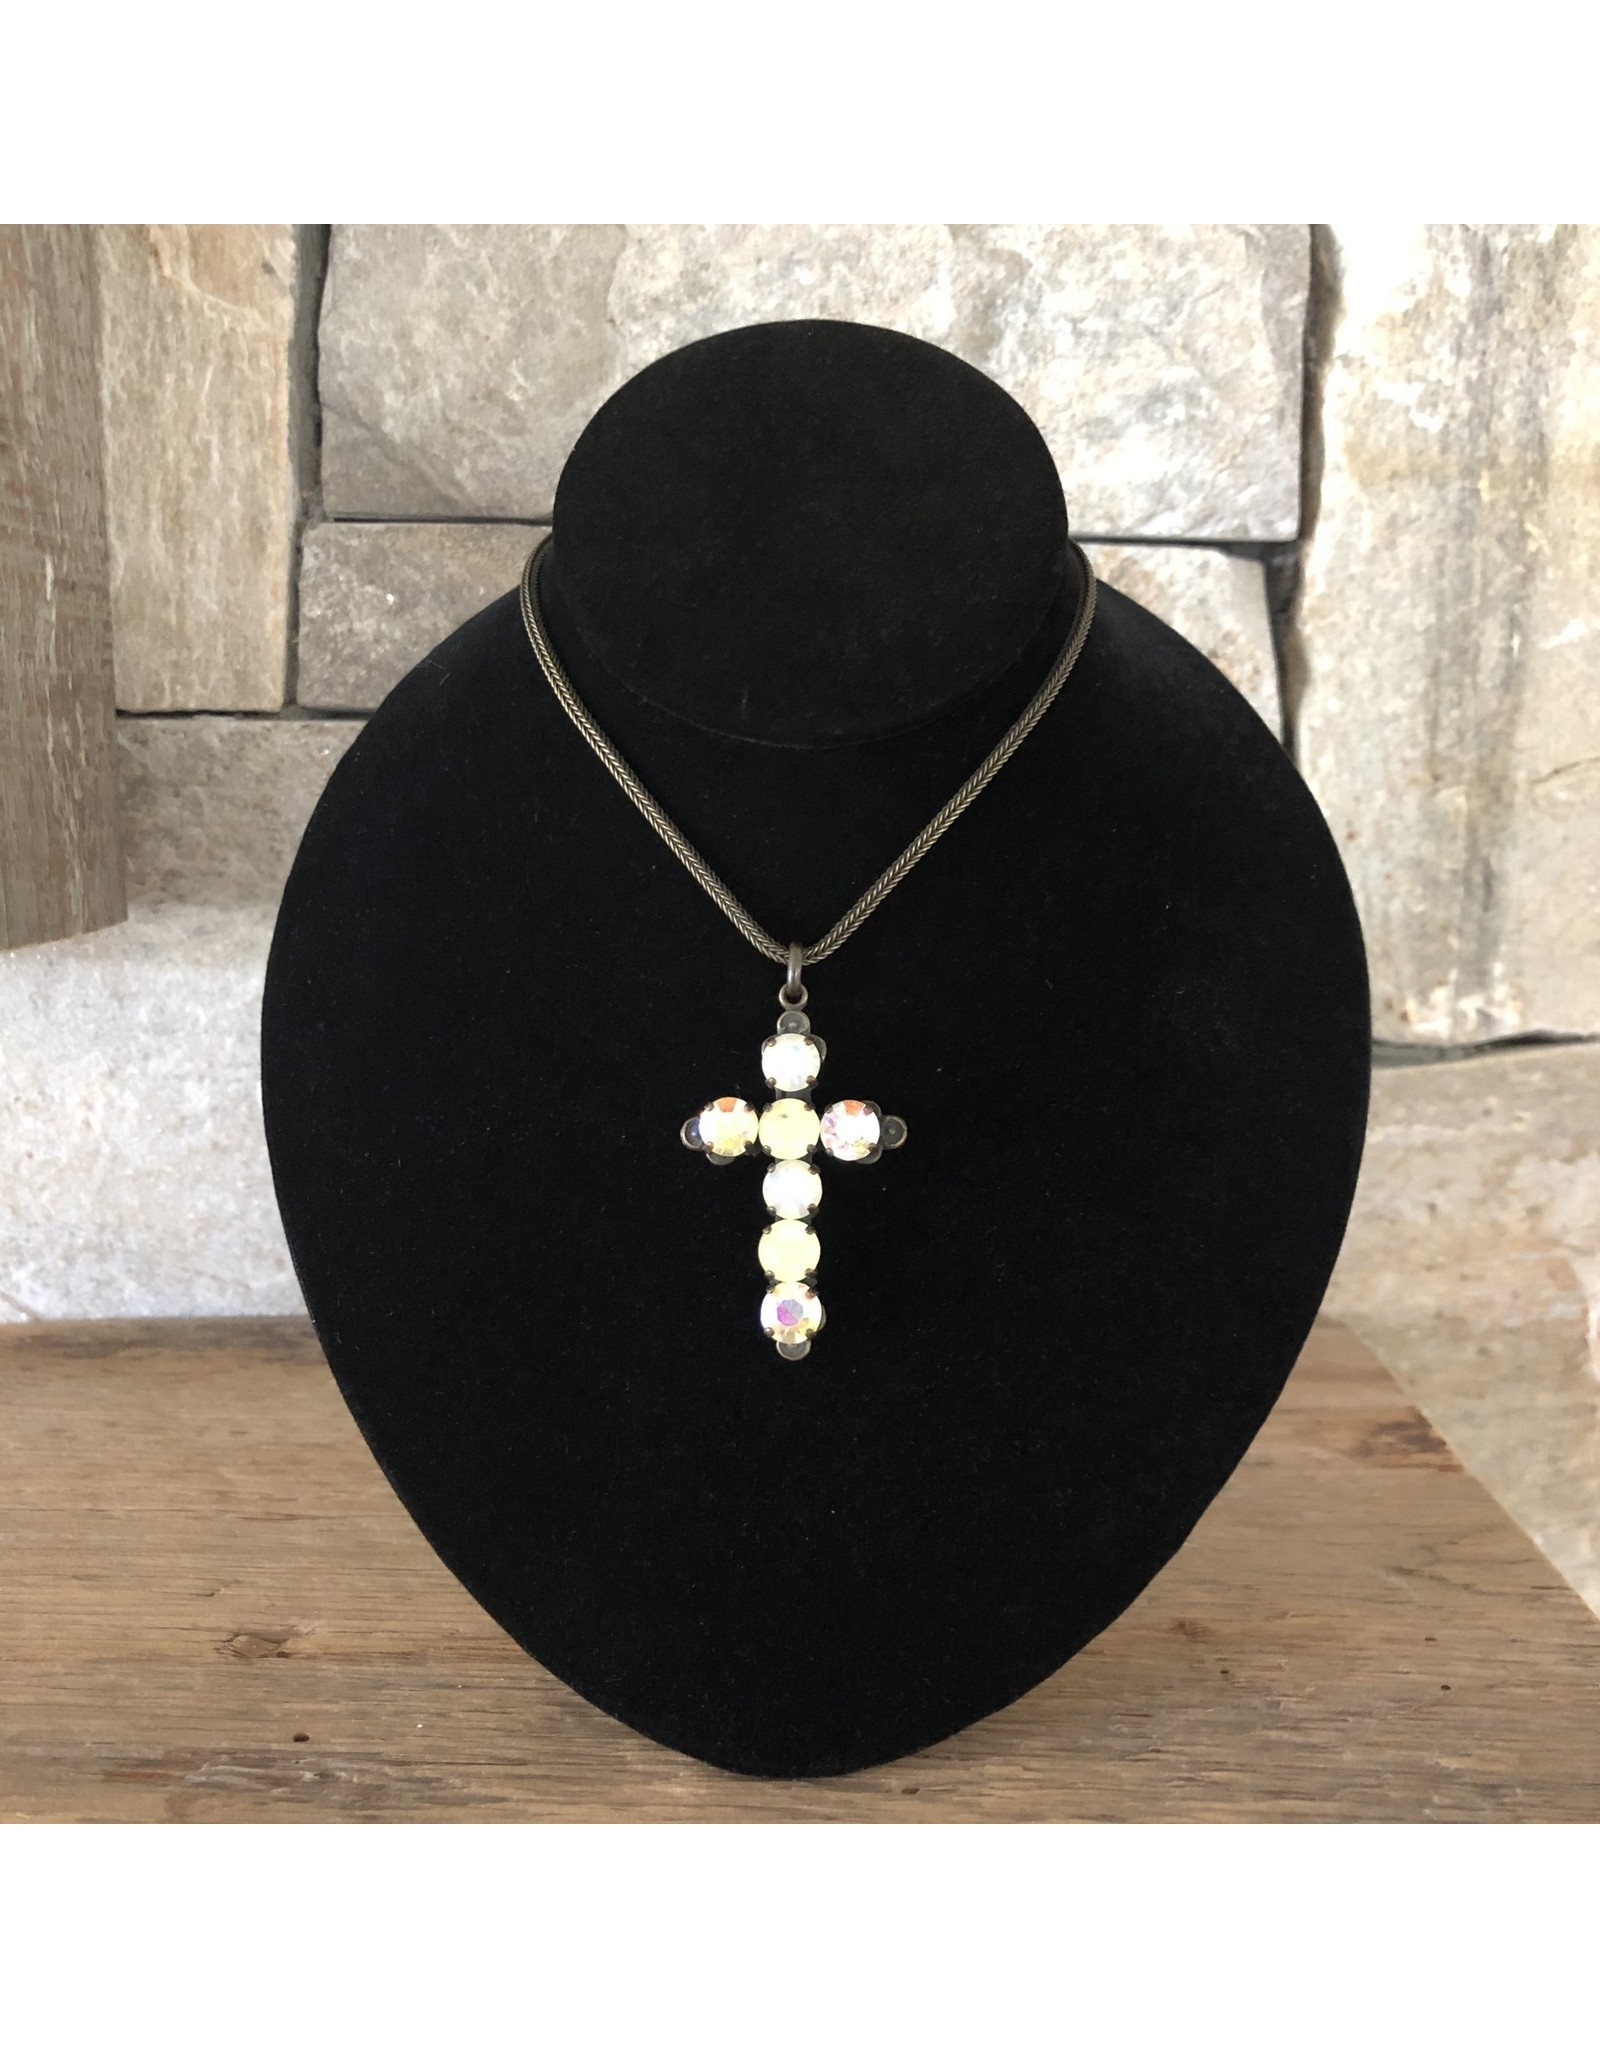 Jean Louis Blinn Yelllow Stones Small Cross Necklace